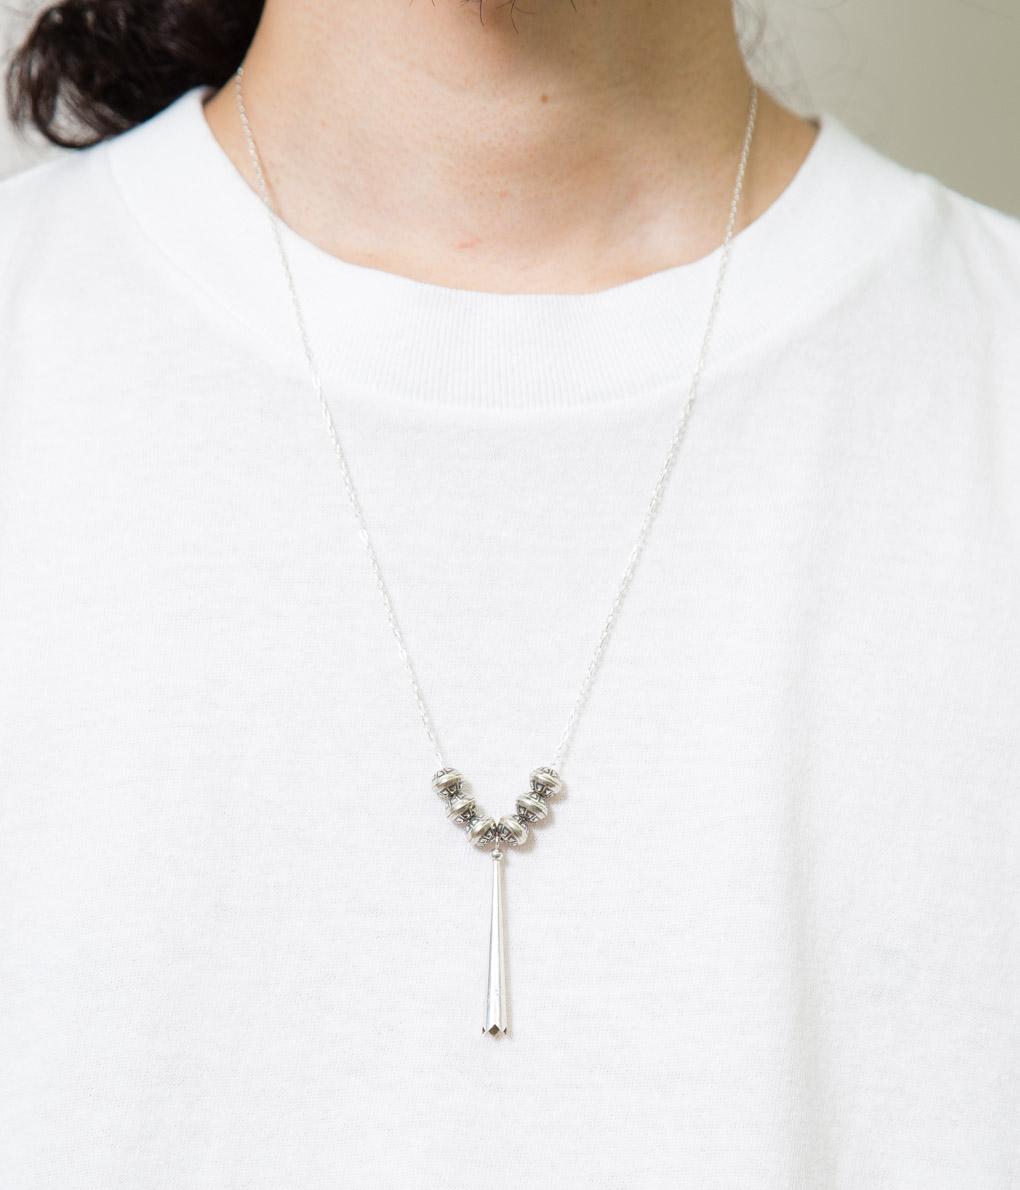 DINEH ディネSanta Fe - Bolo tip Necklace(Silver)